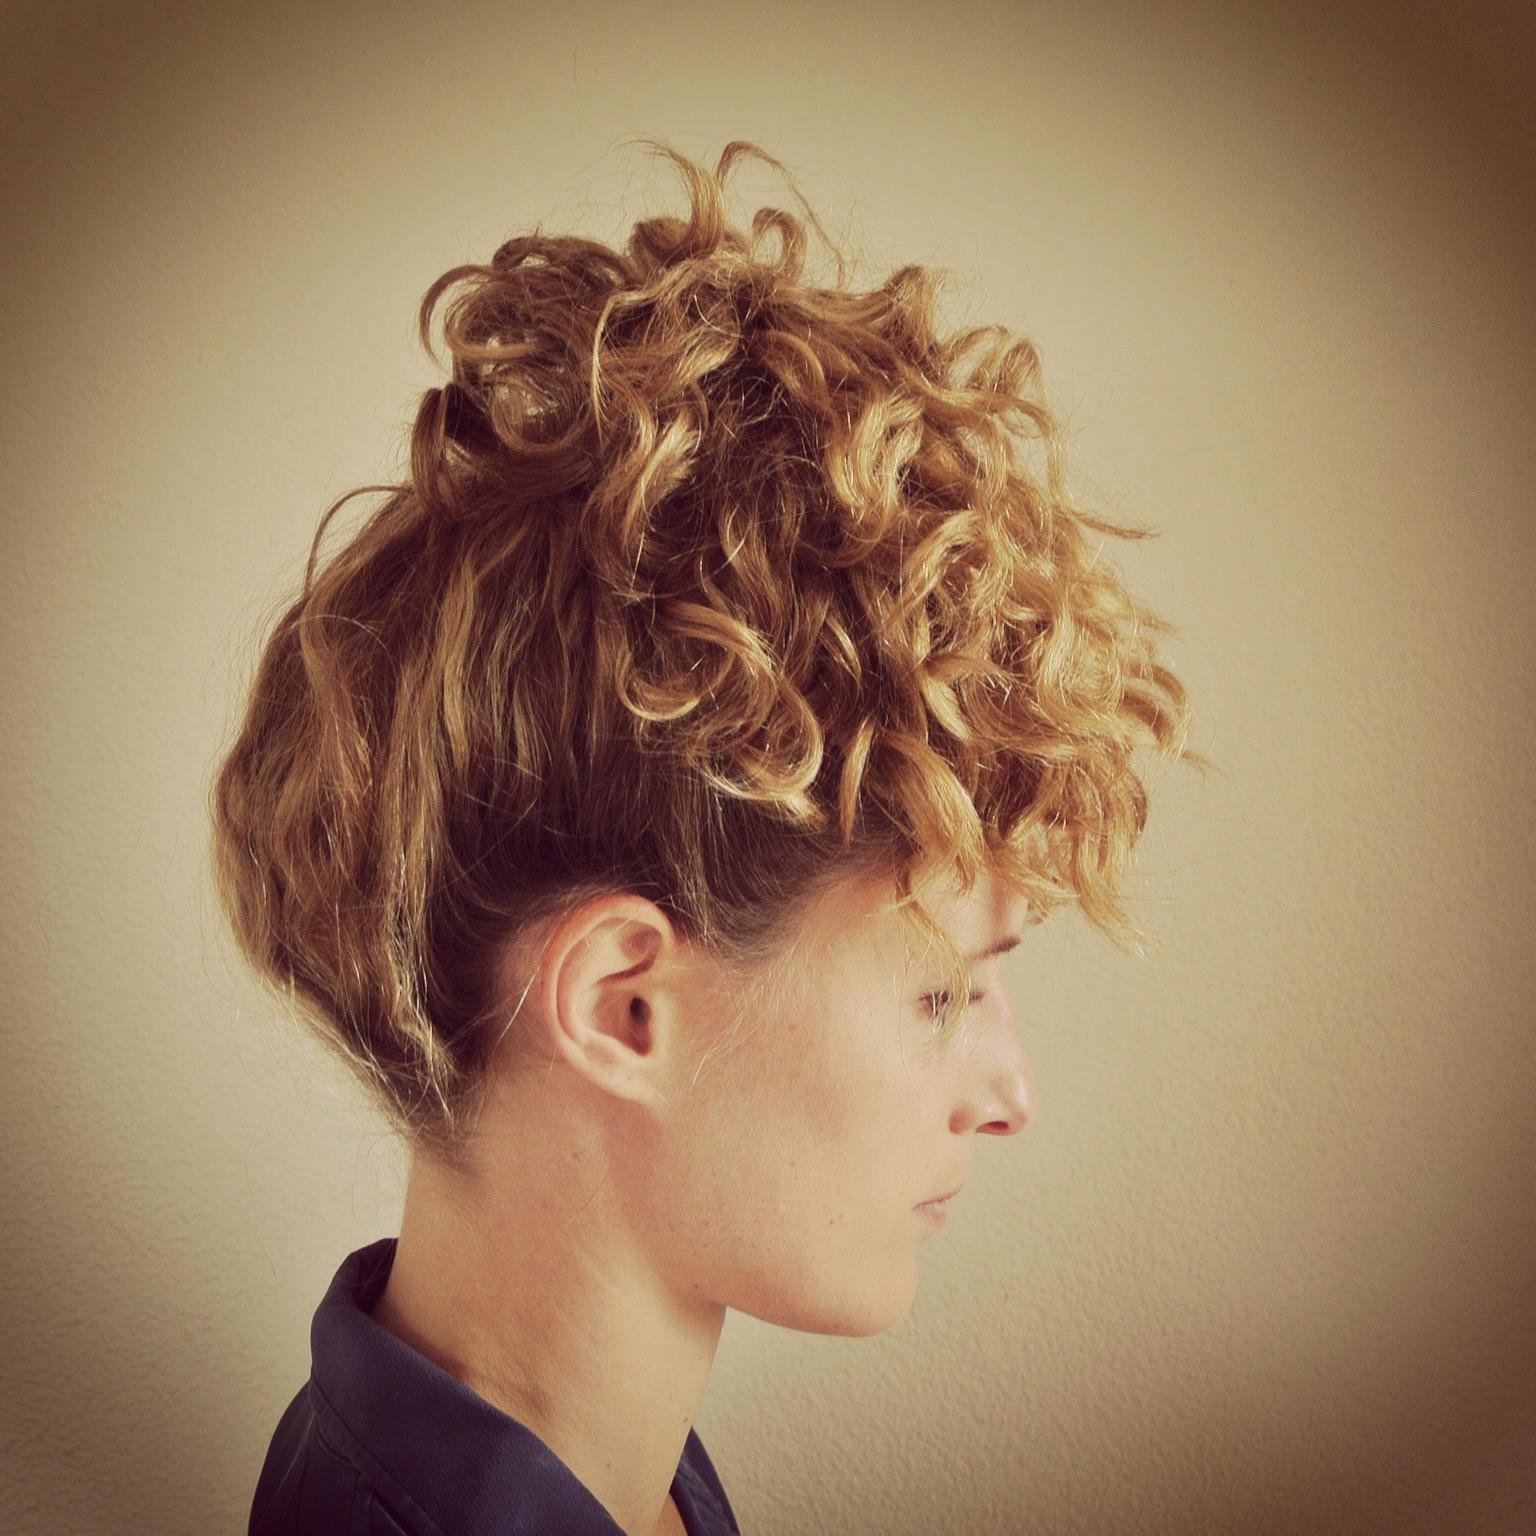 washing curly hair